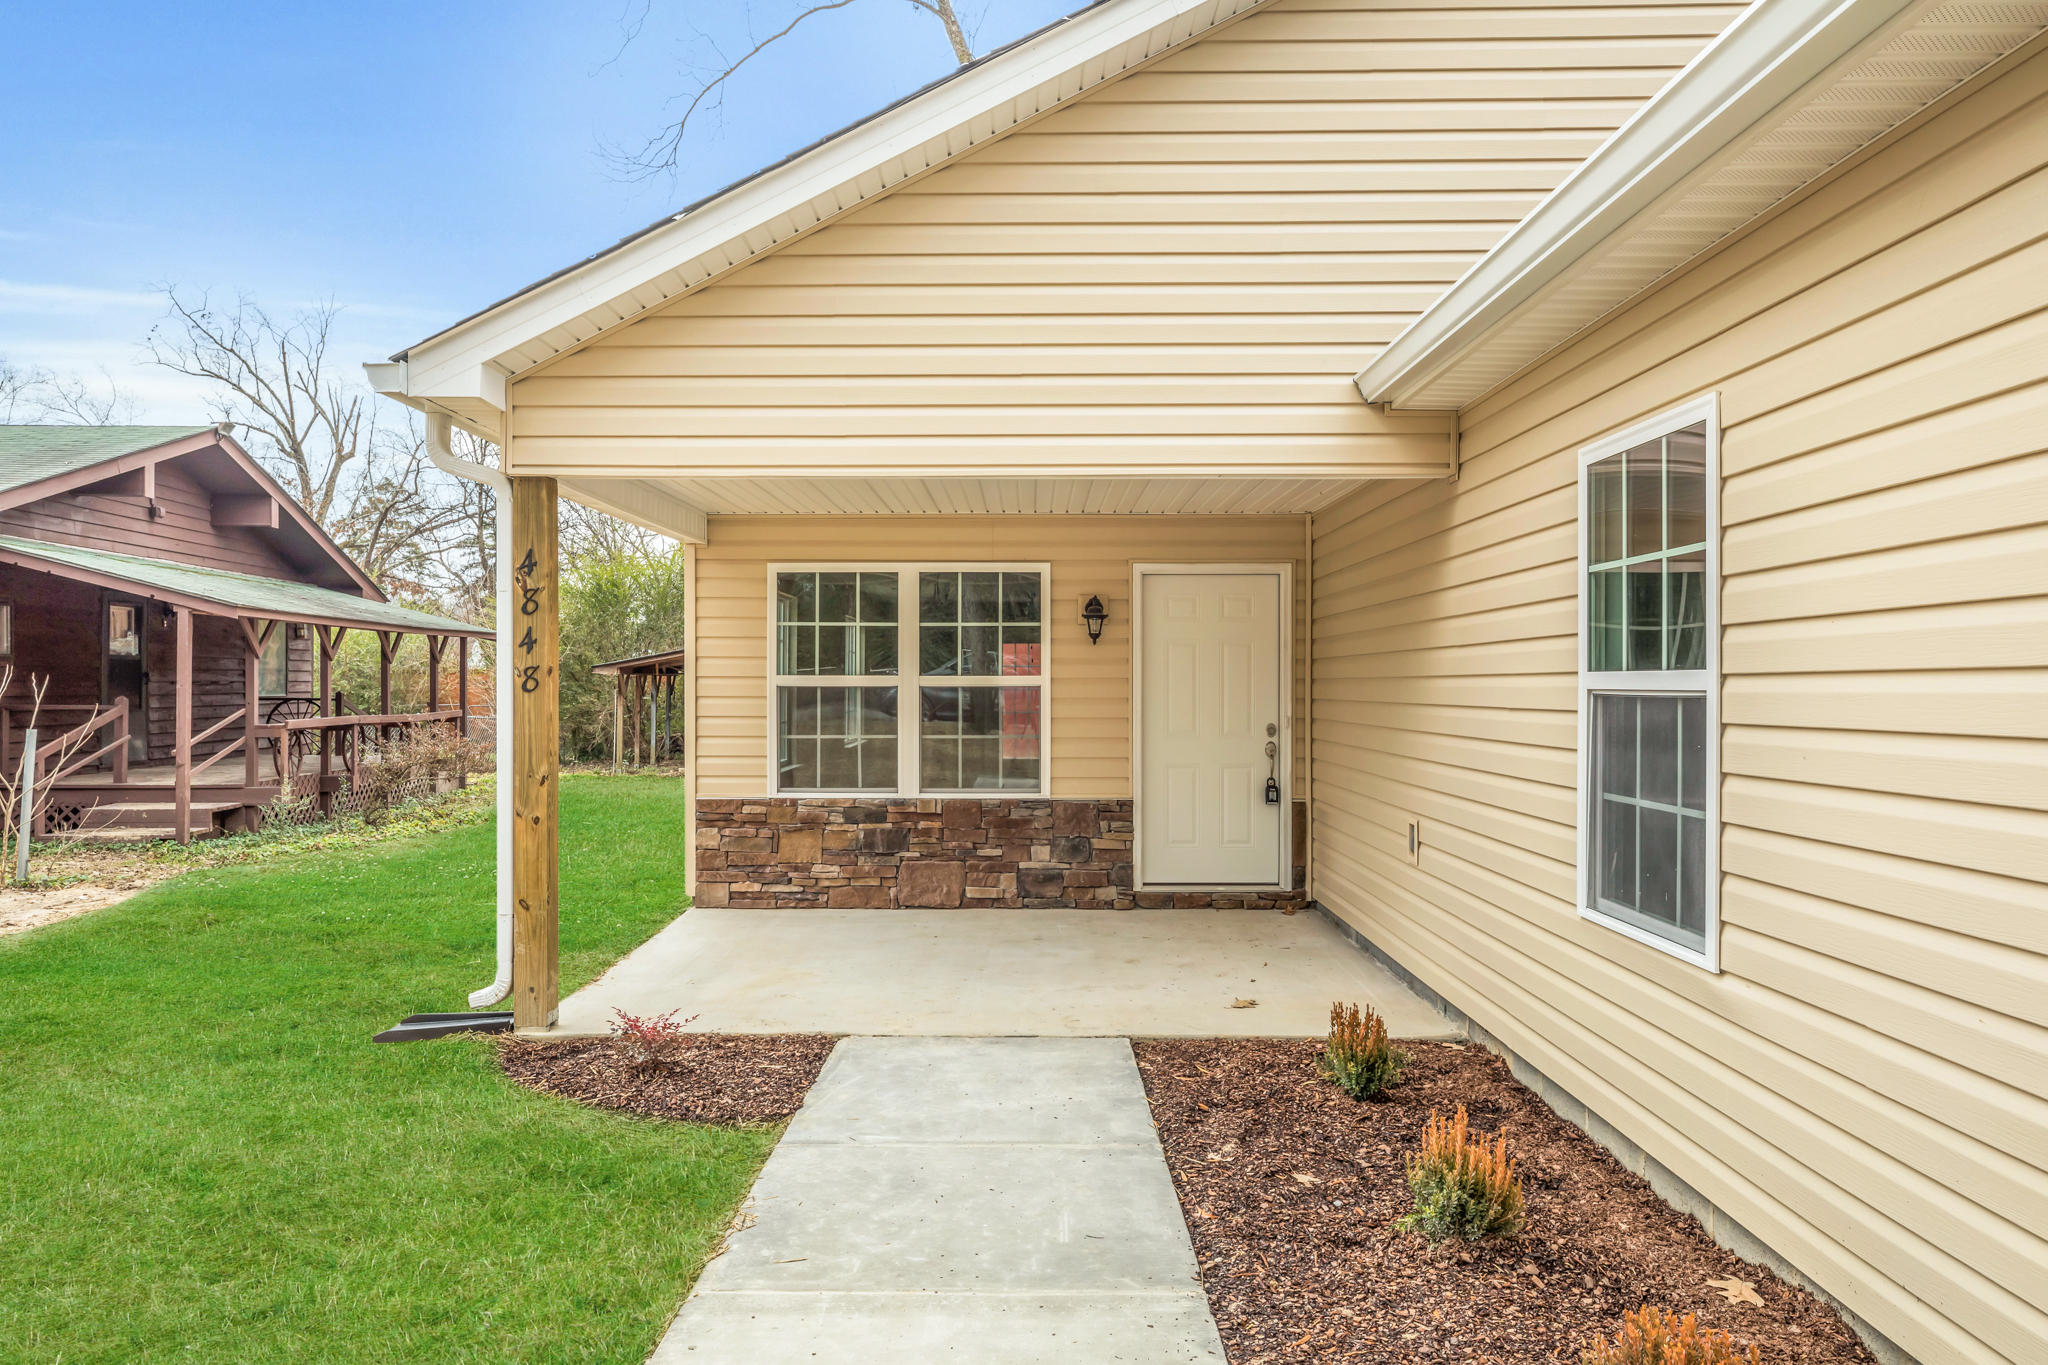 4844 Pawnee Tr, Chattanooga, TN 37411